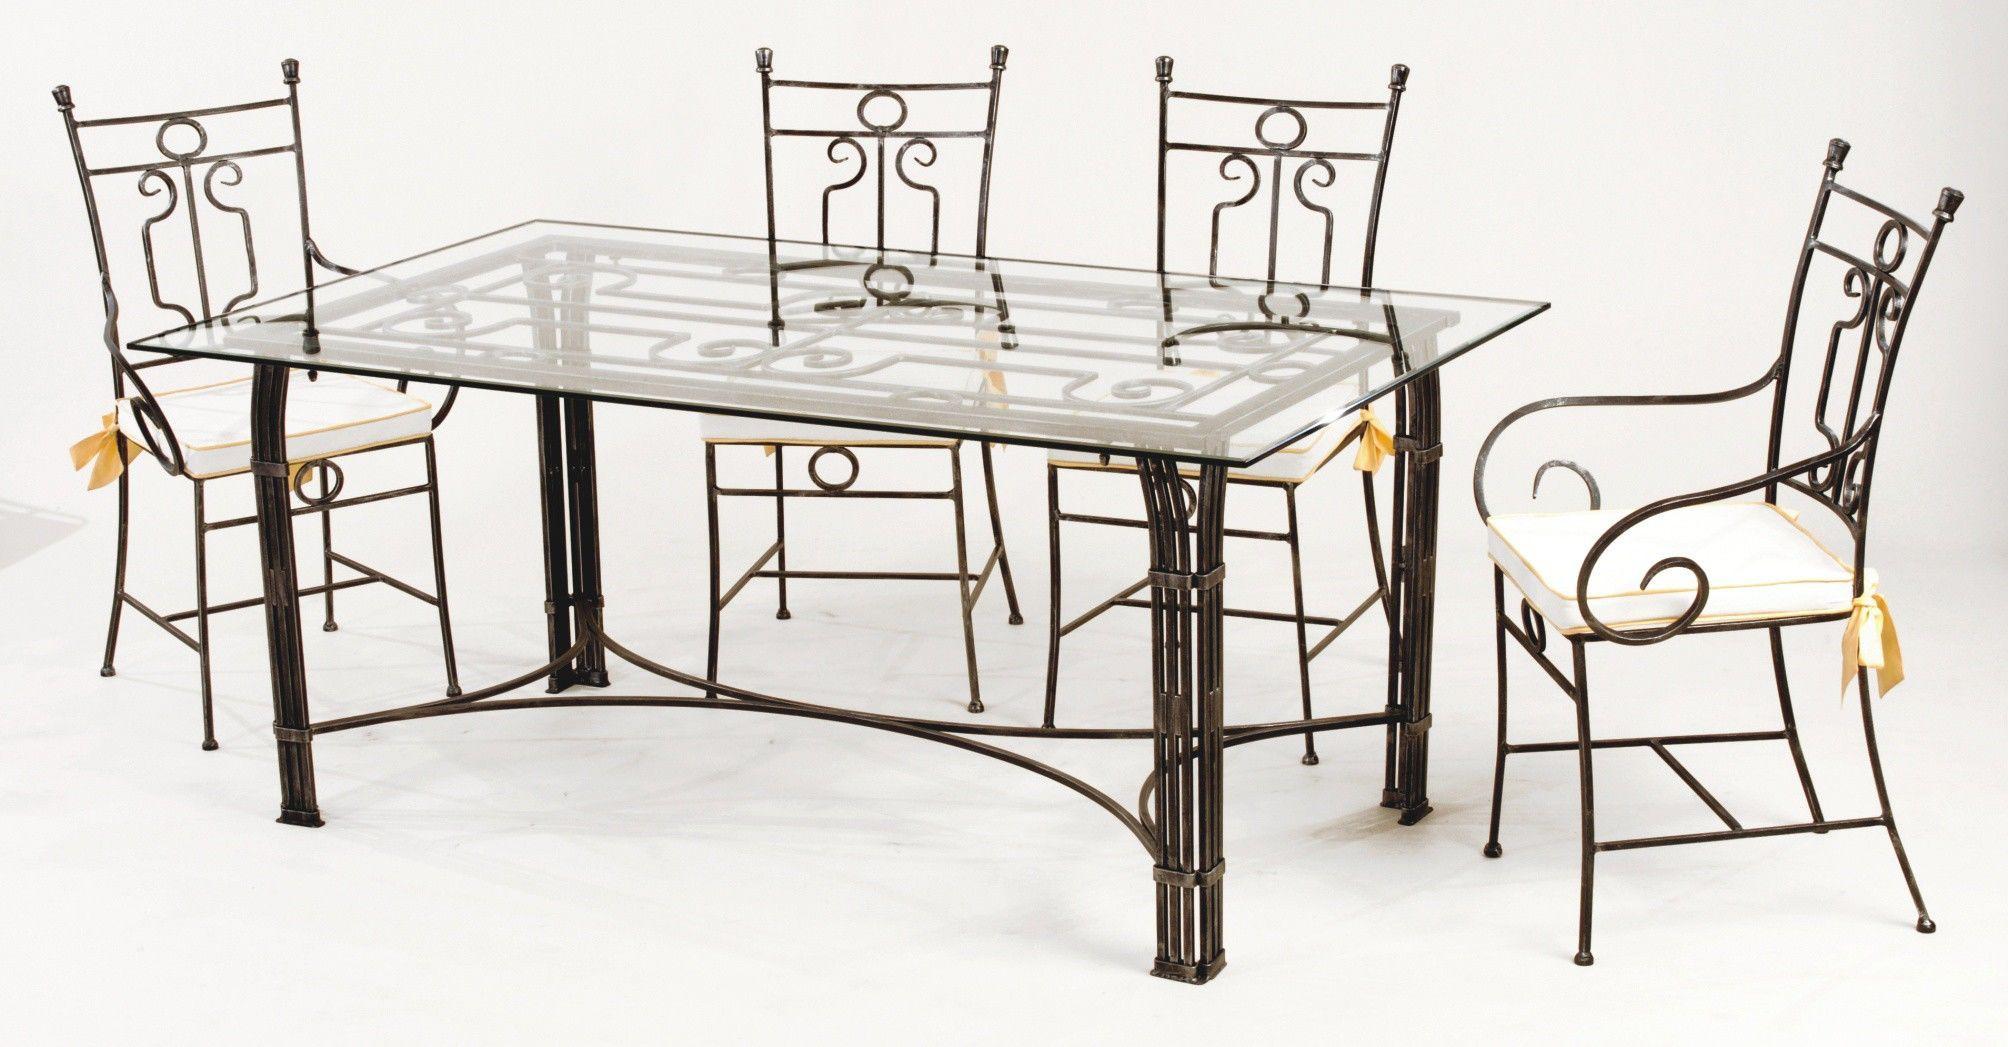 Table De Salle A Manger Avec Chaise Pas Cher Furniture Upholstery